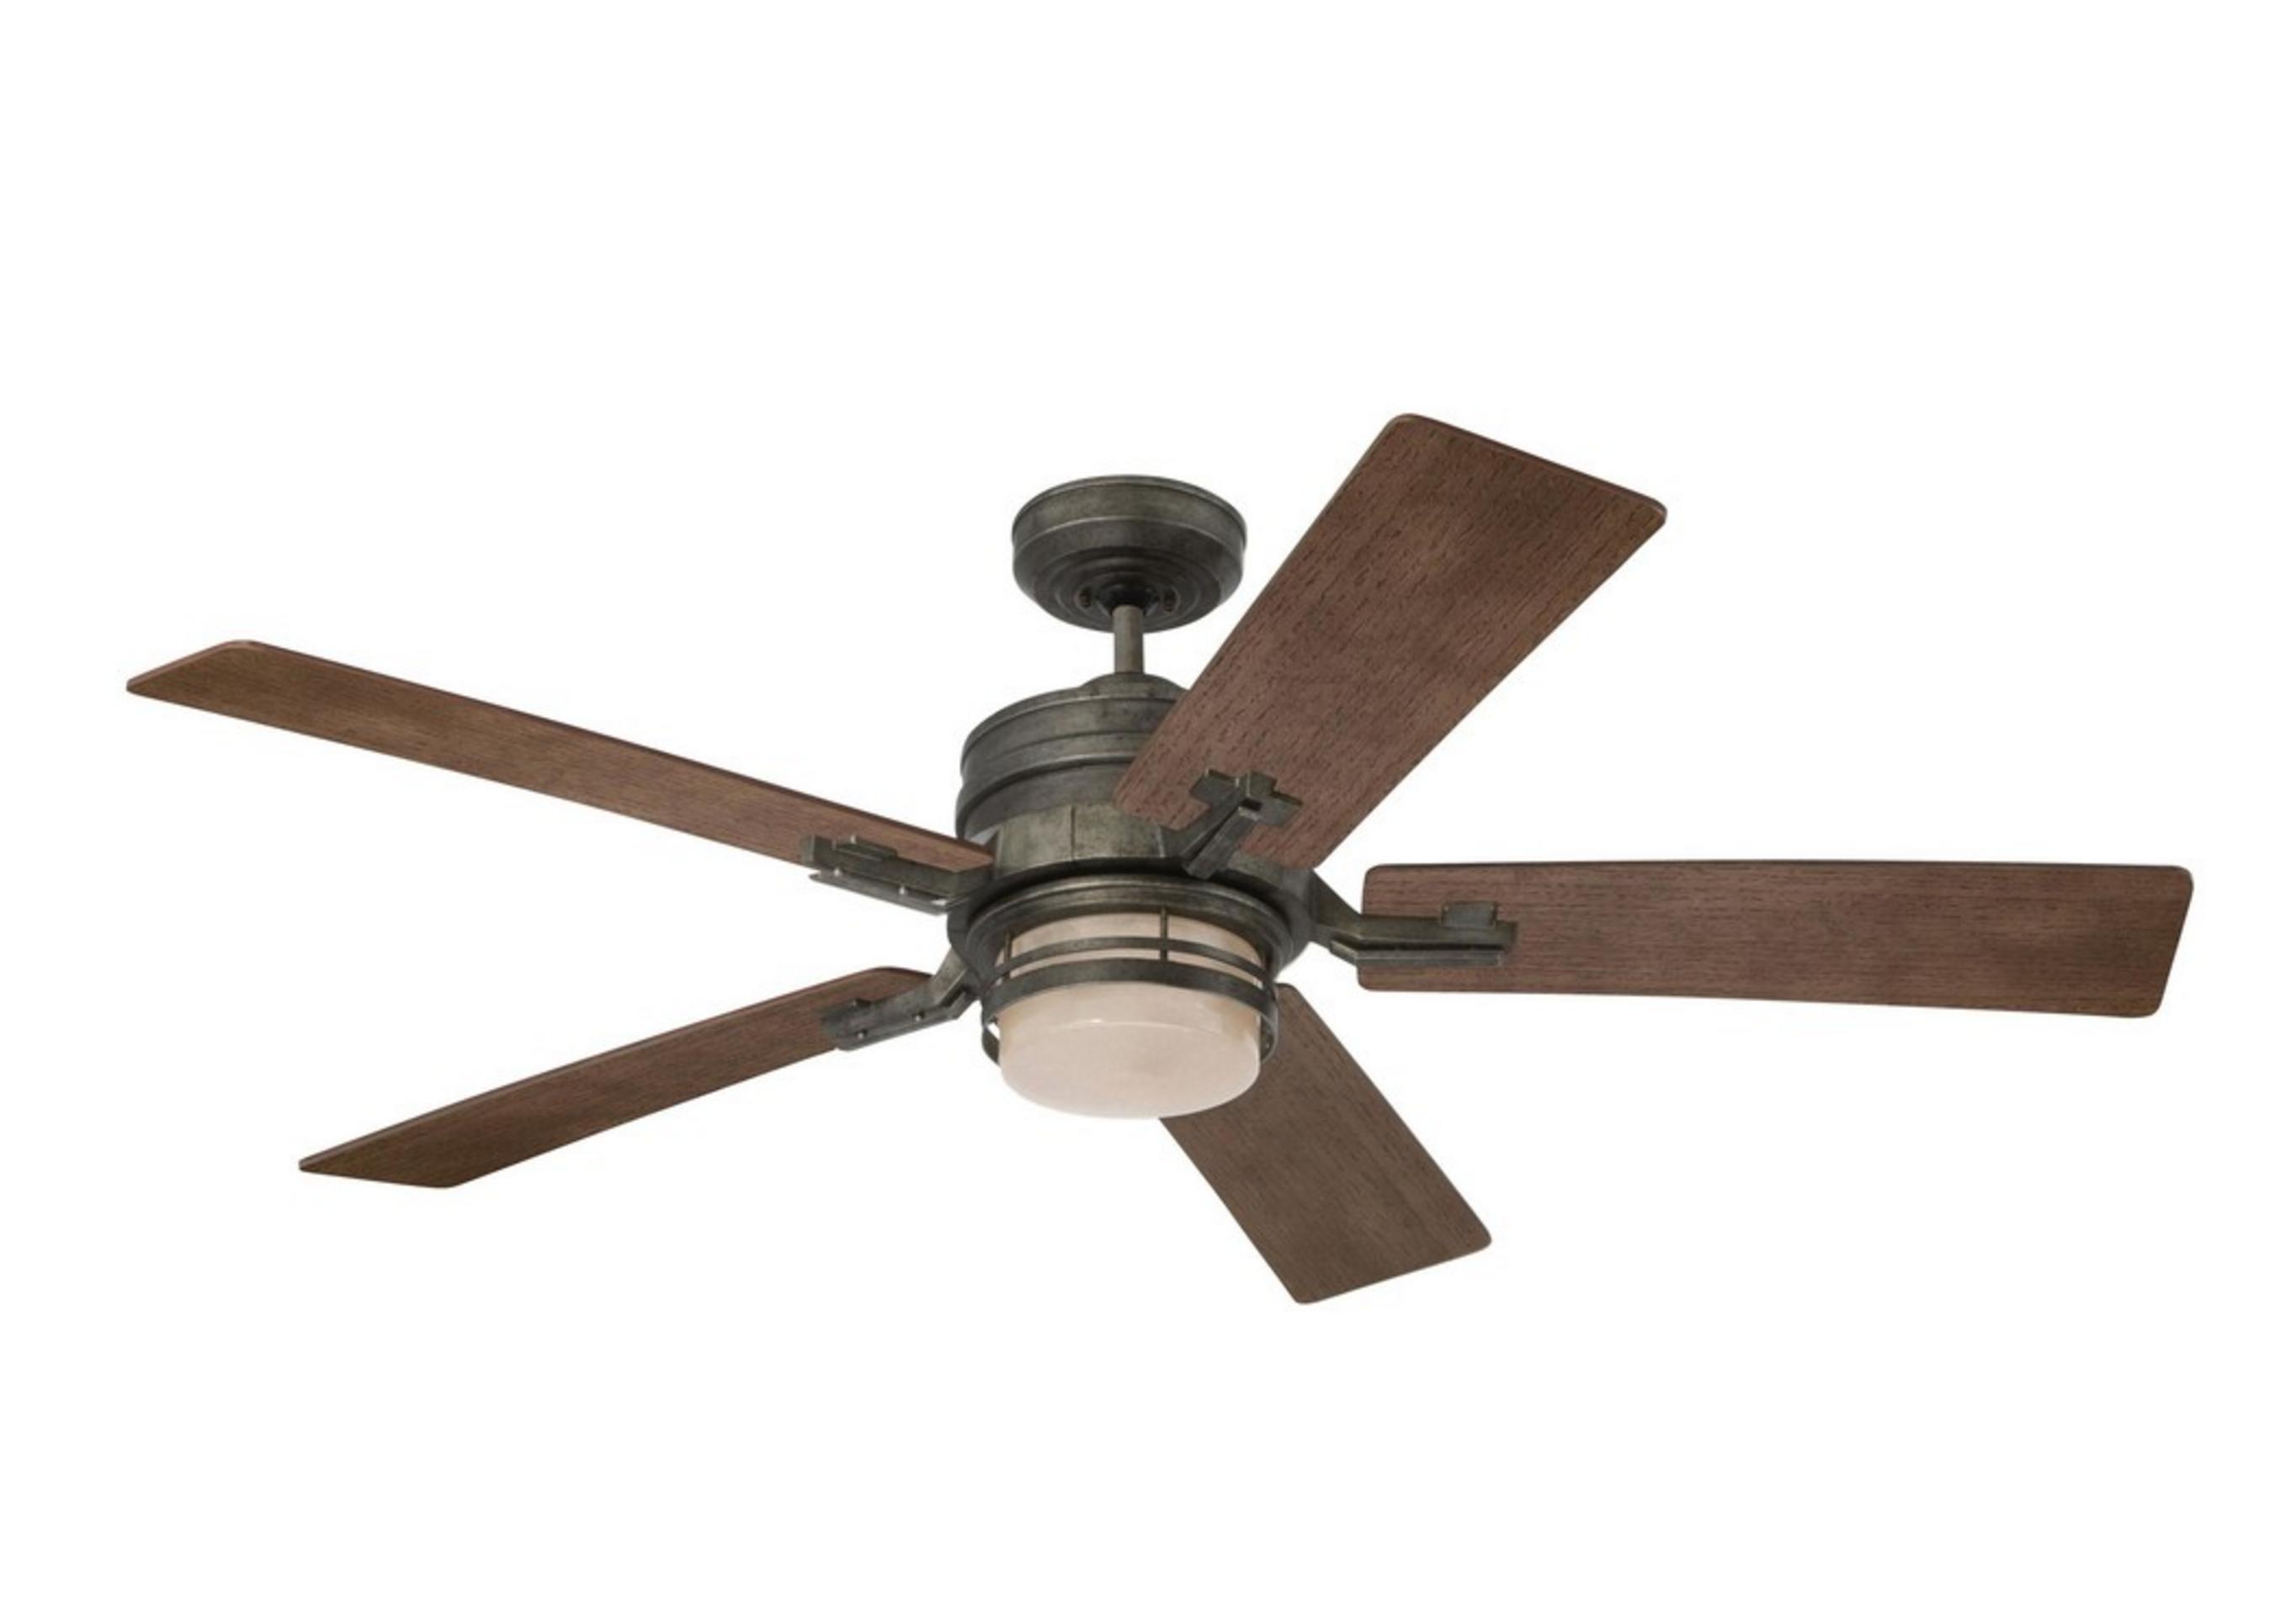 Emerson amhurst vintage steel 54 ceiling fan with light control